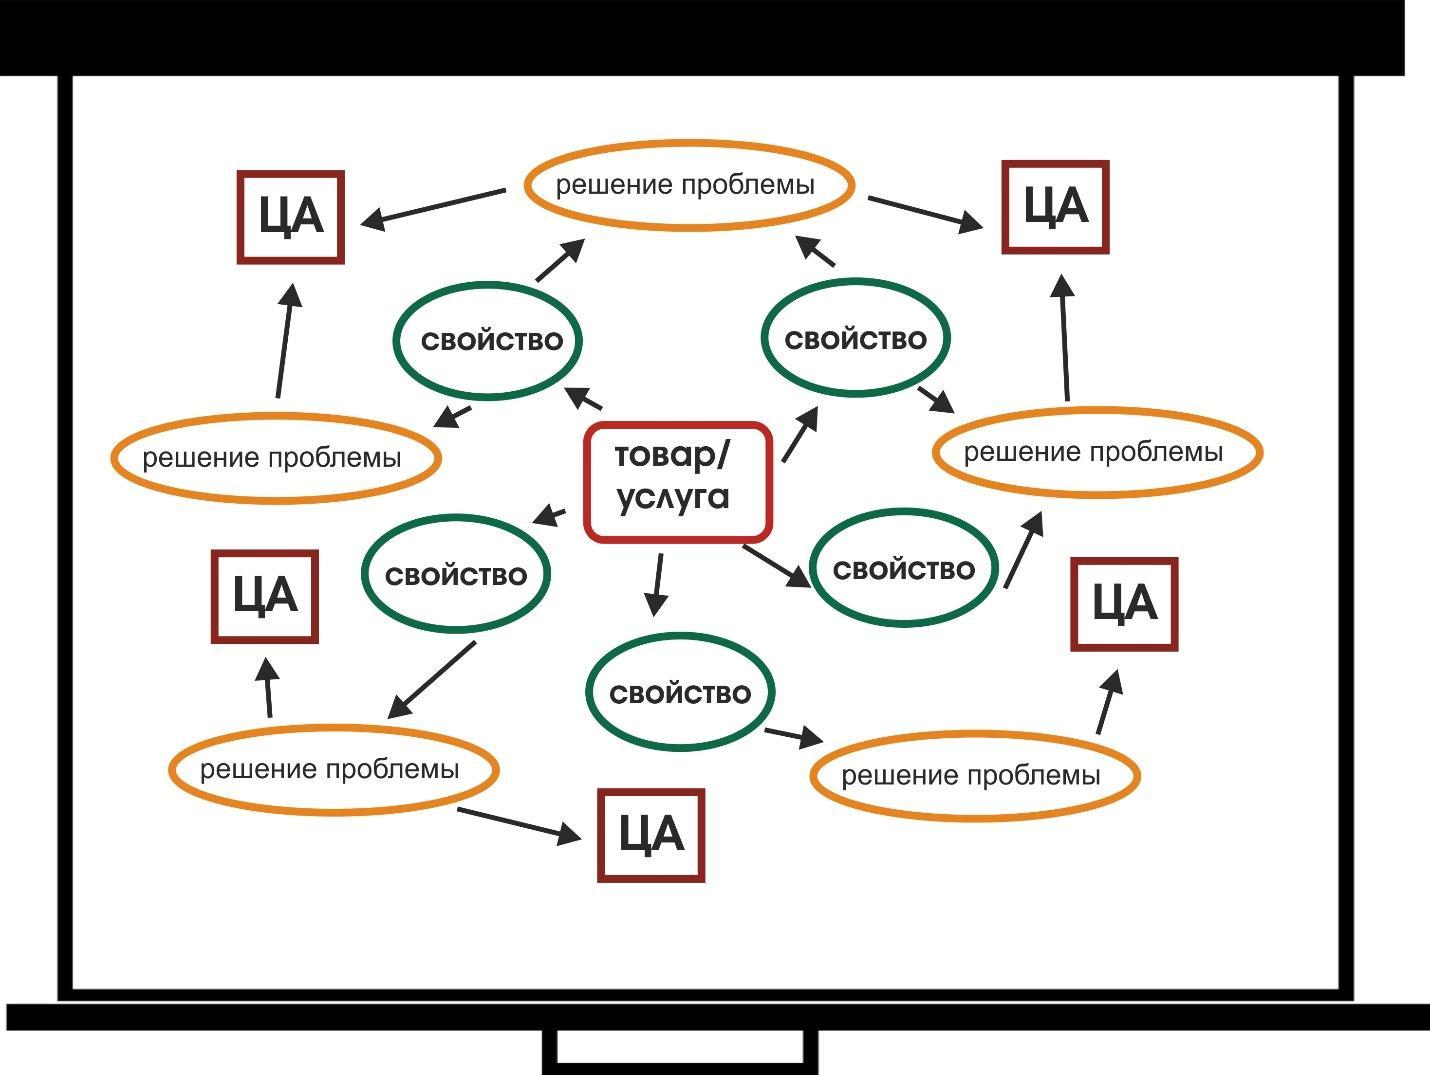 E:\РАБОТА\МЕДИАНАЦИЯ\Генерация скрытых интересов\Mind Map 1.jpg